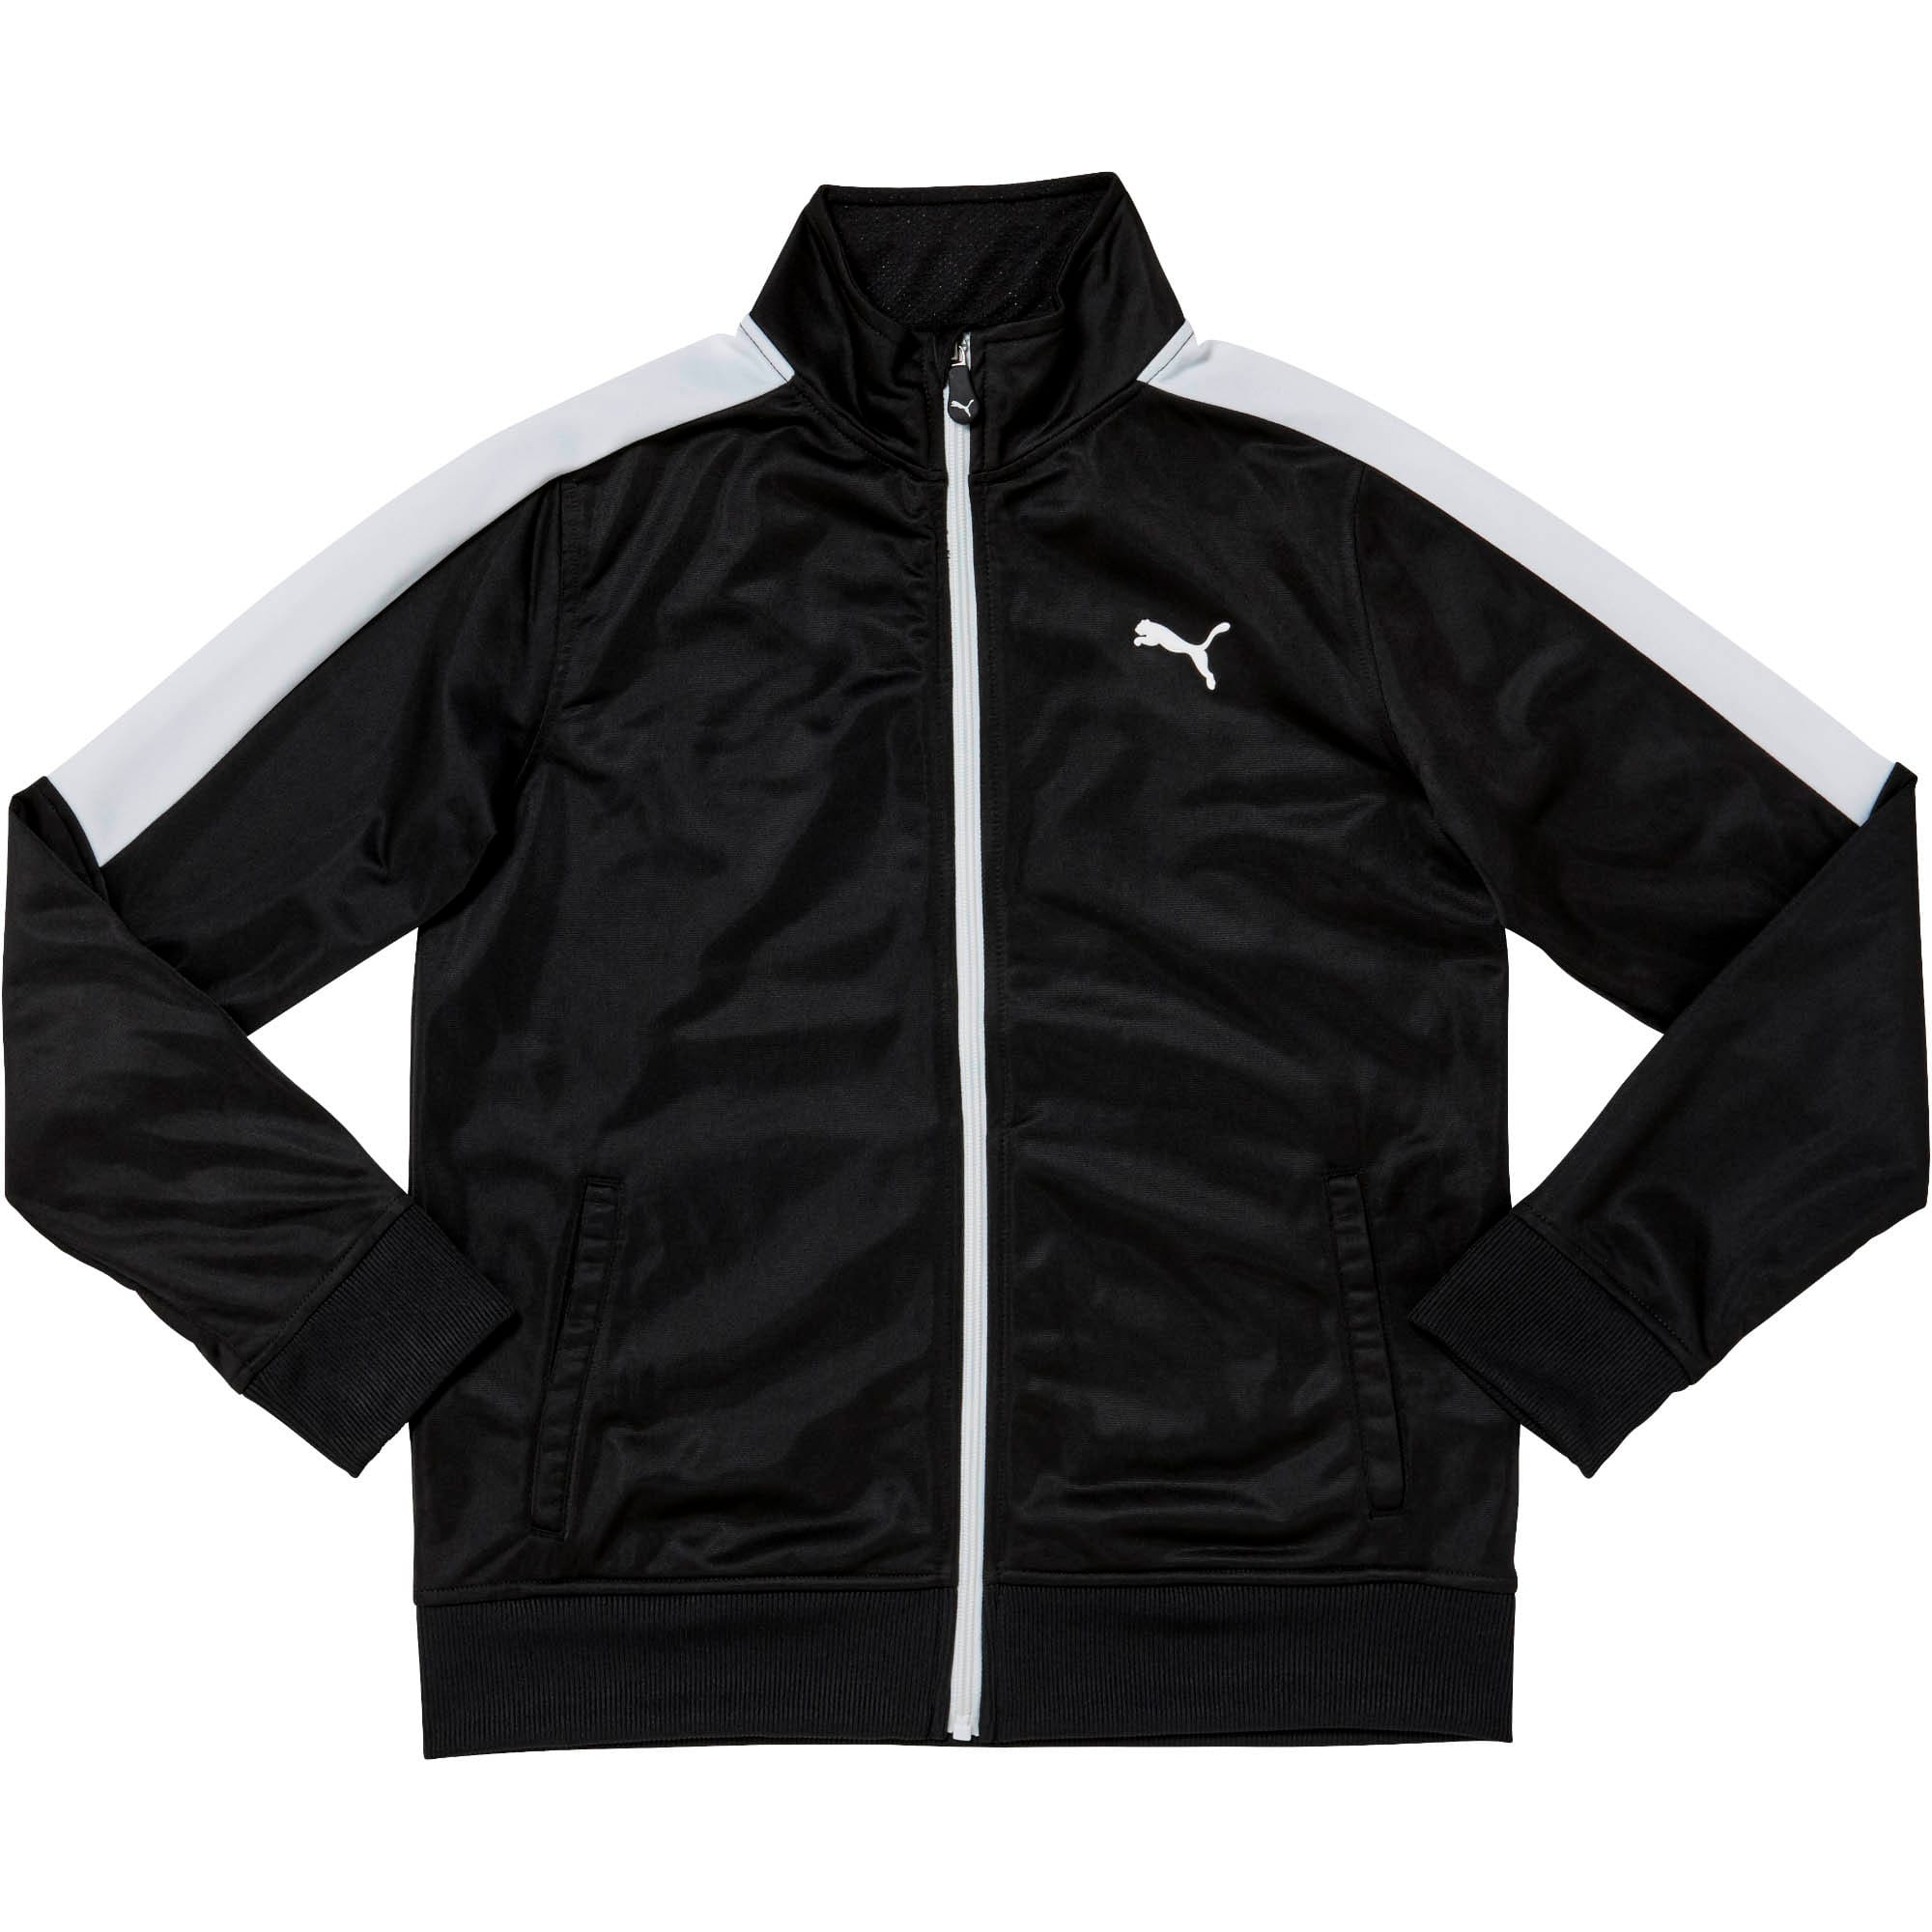 Thumbnail 1 of Boys' Track Jacket JR, PUMA BLACK, medium